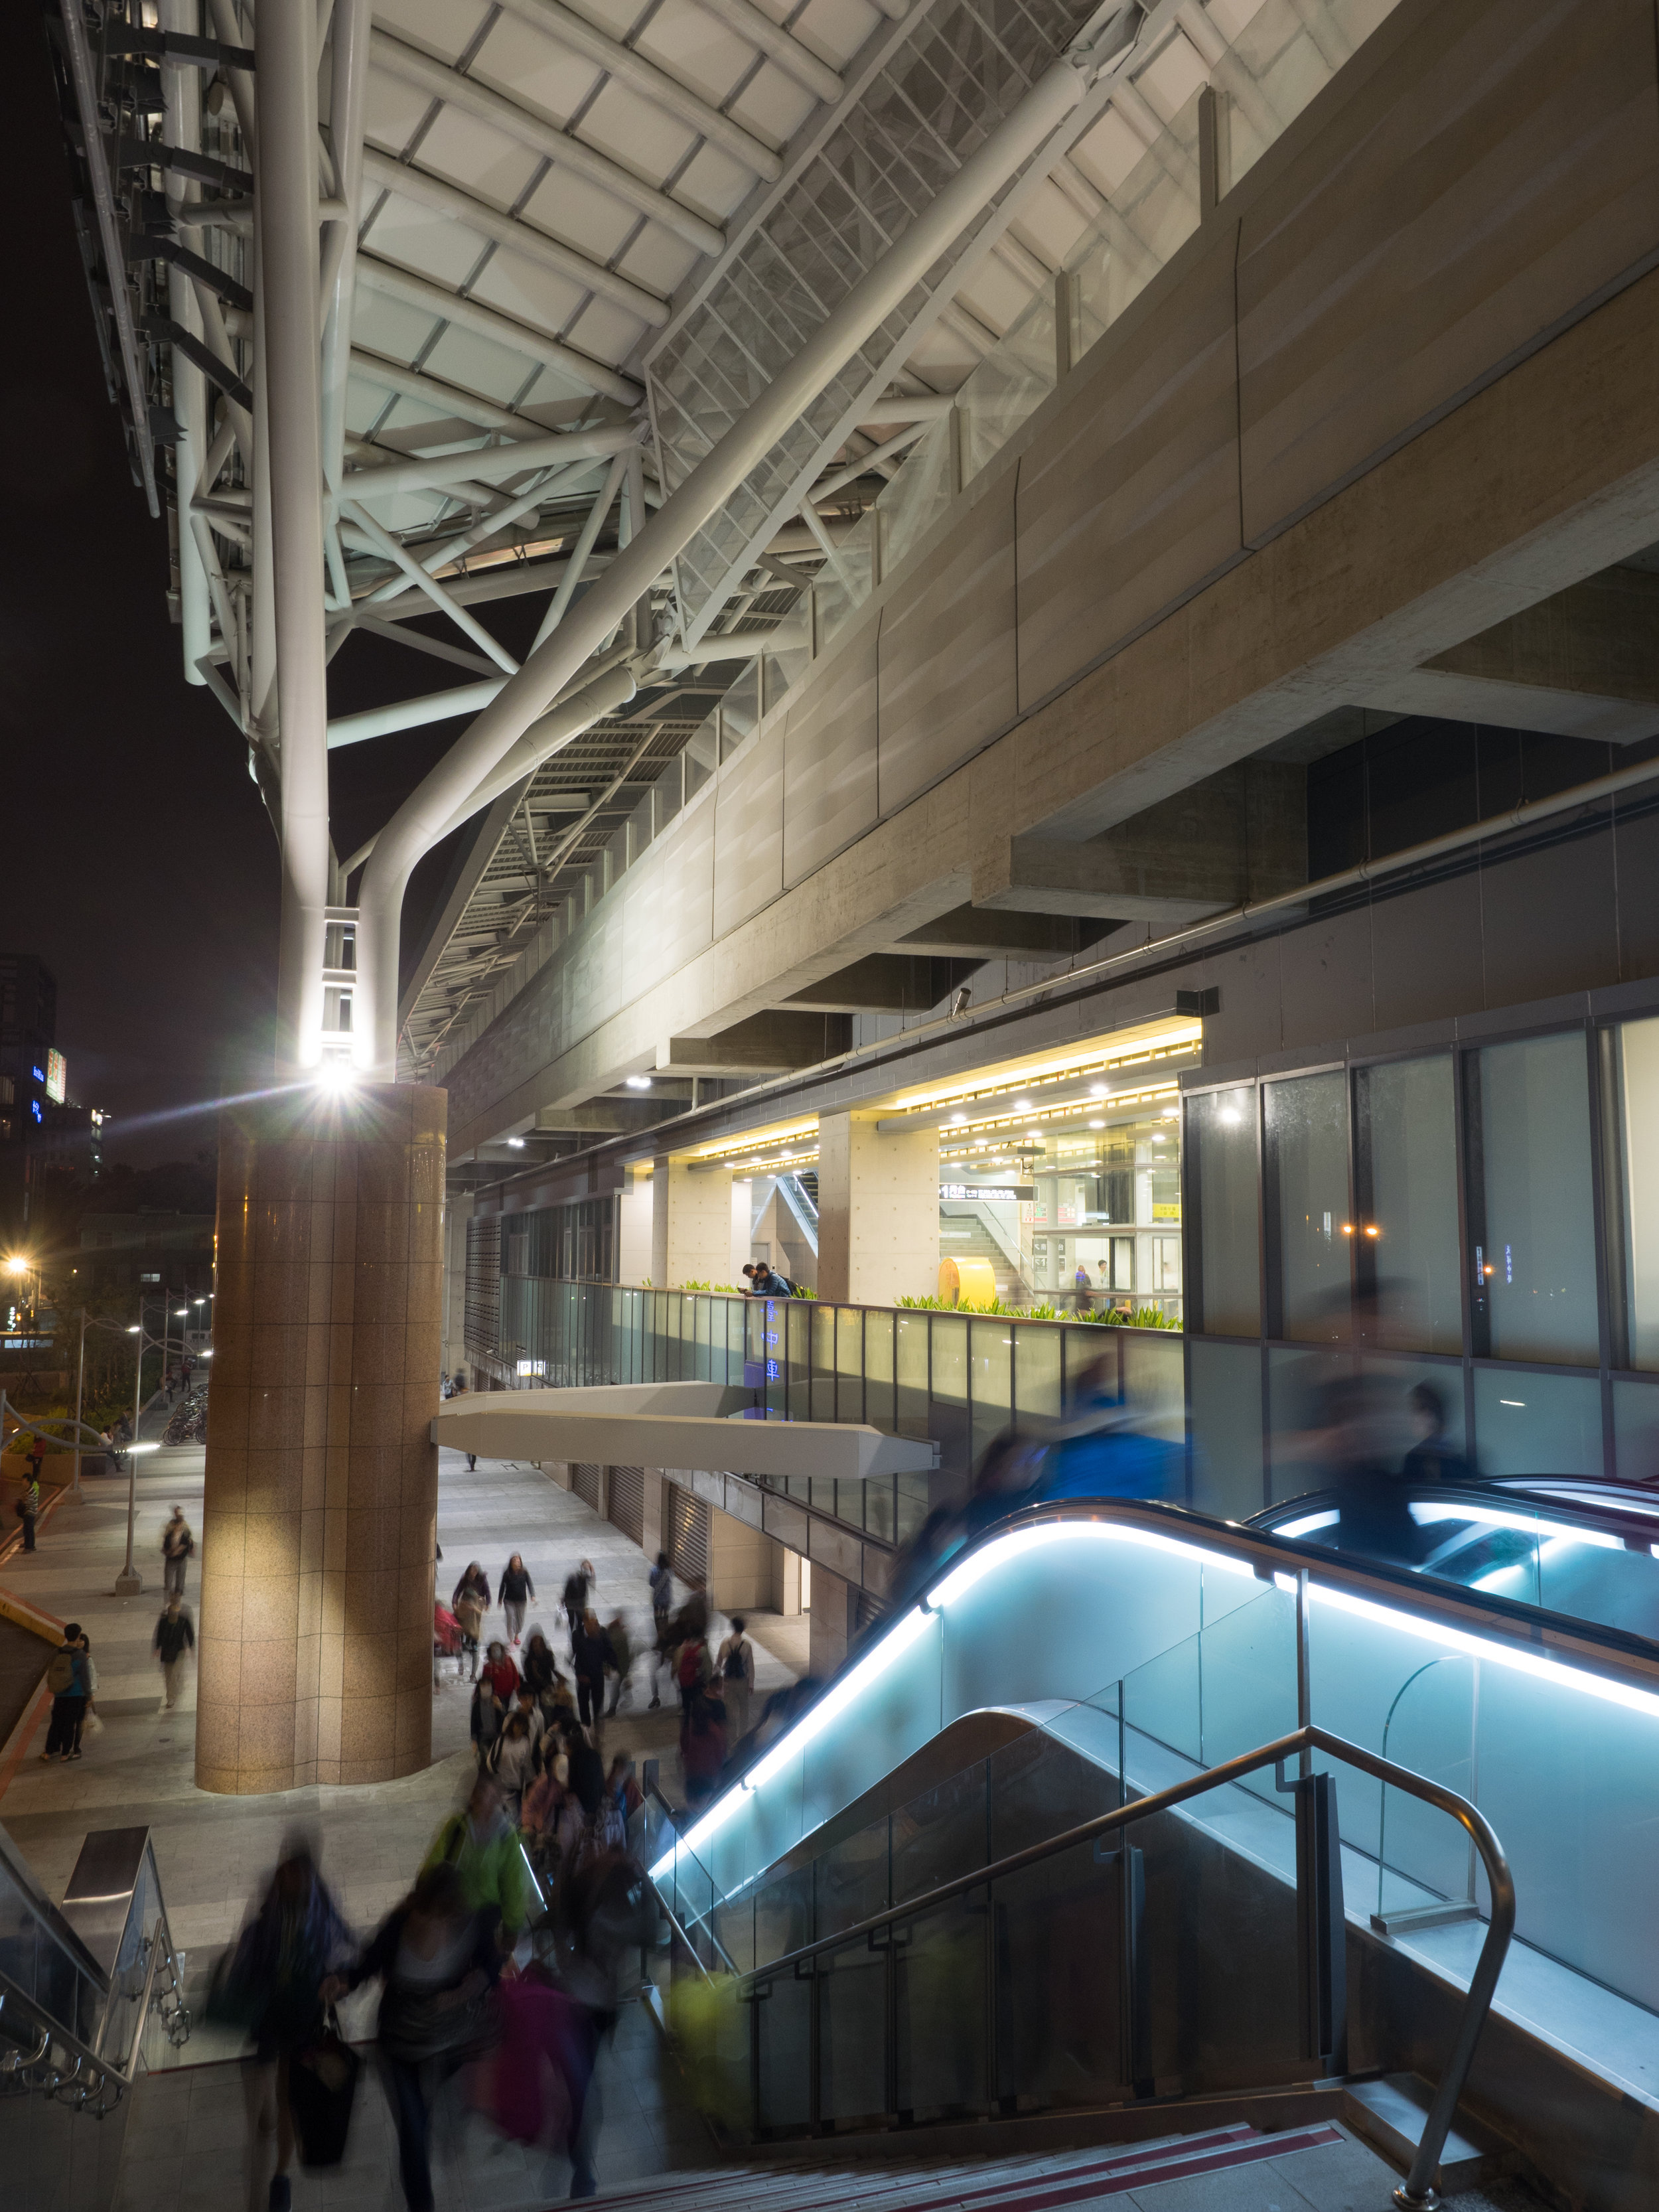 Taichung HSR station